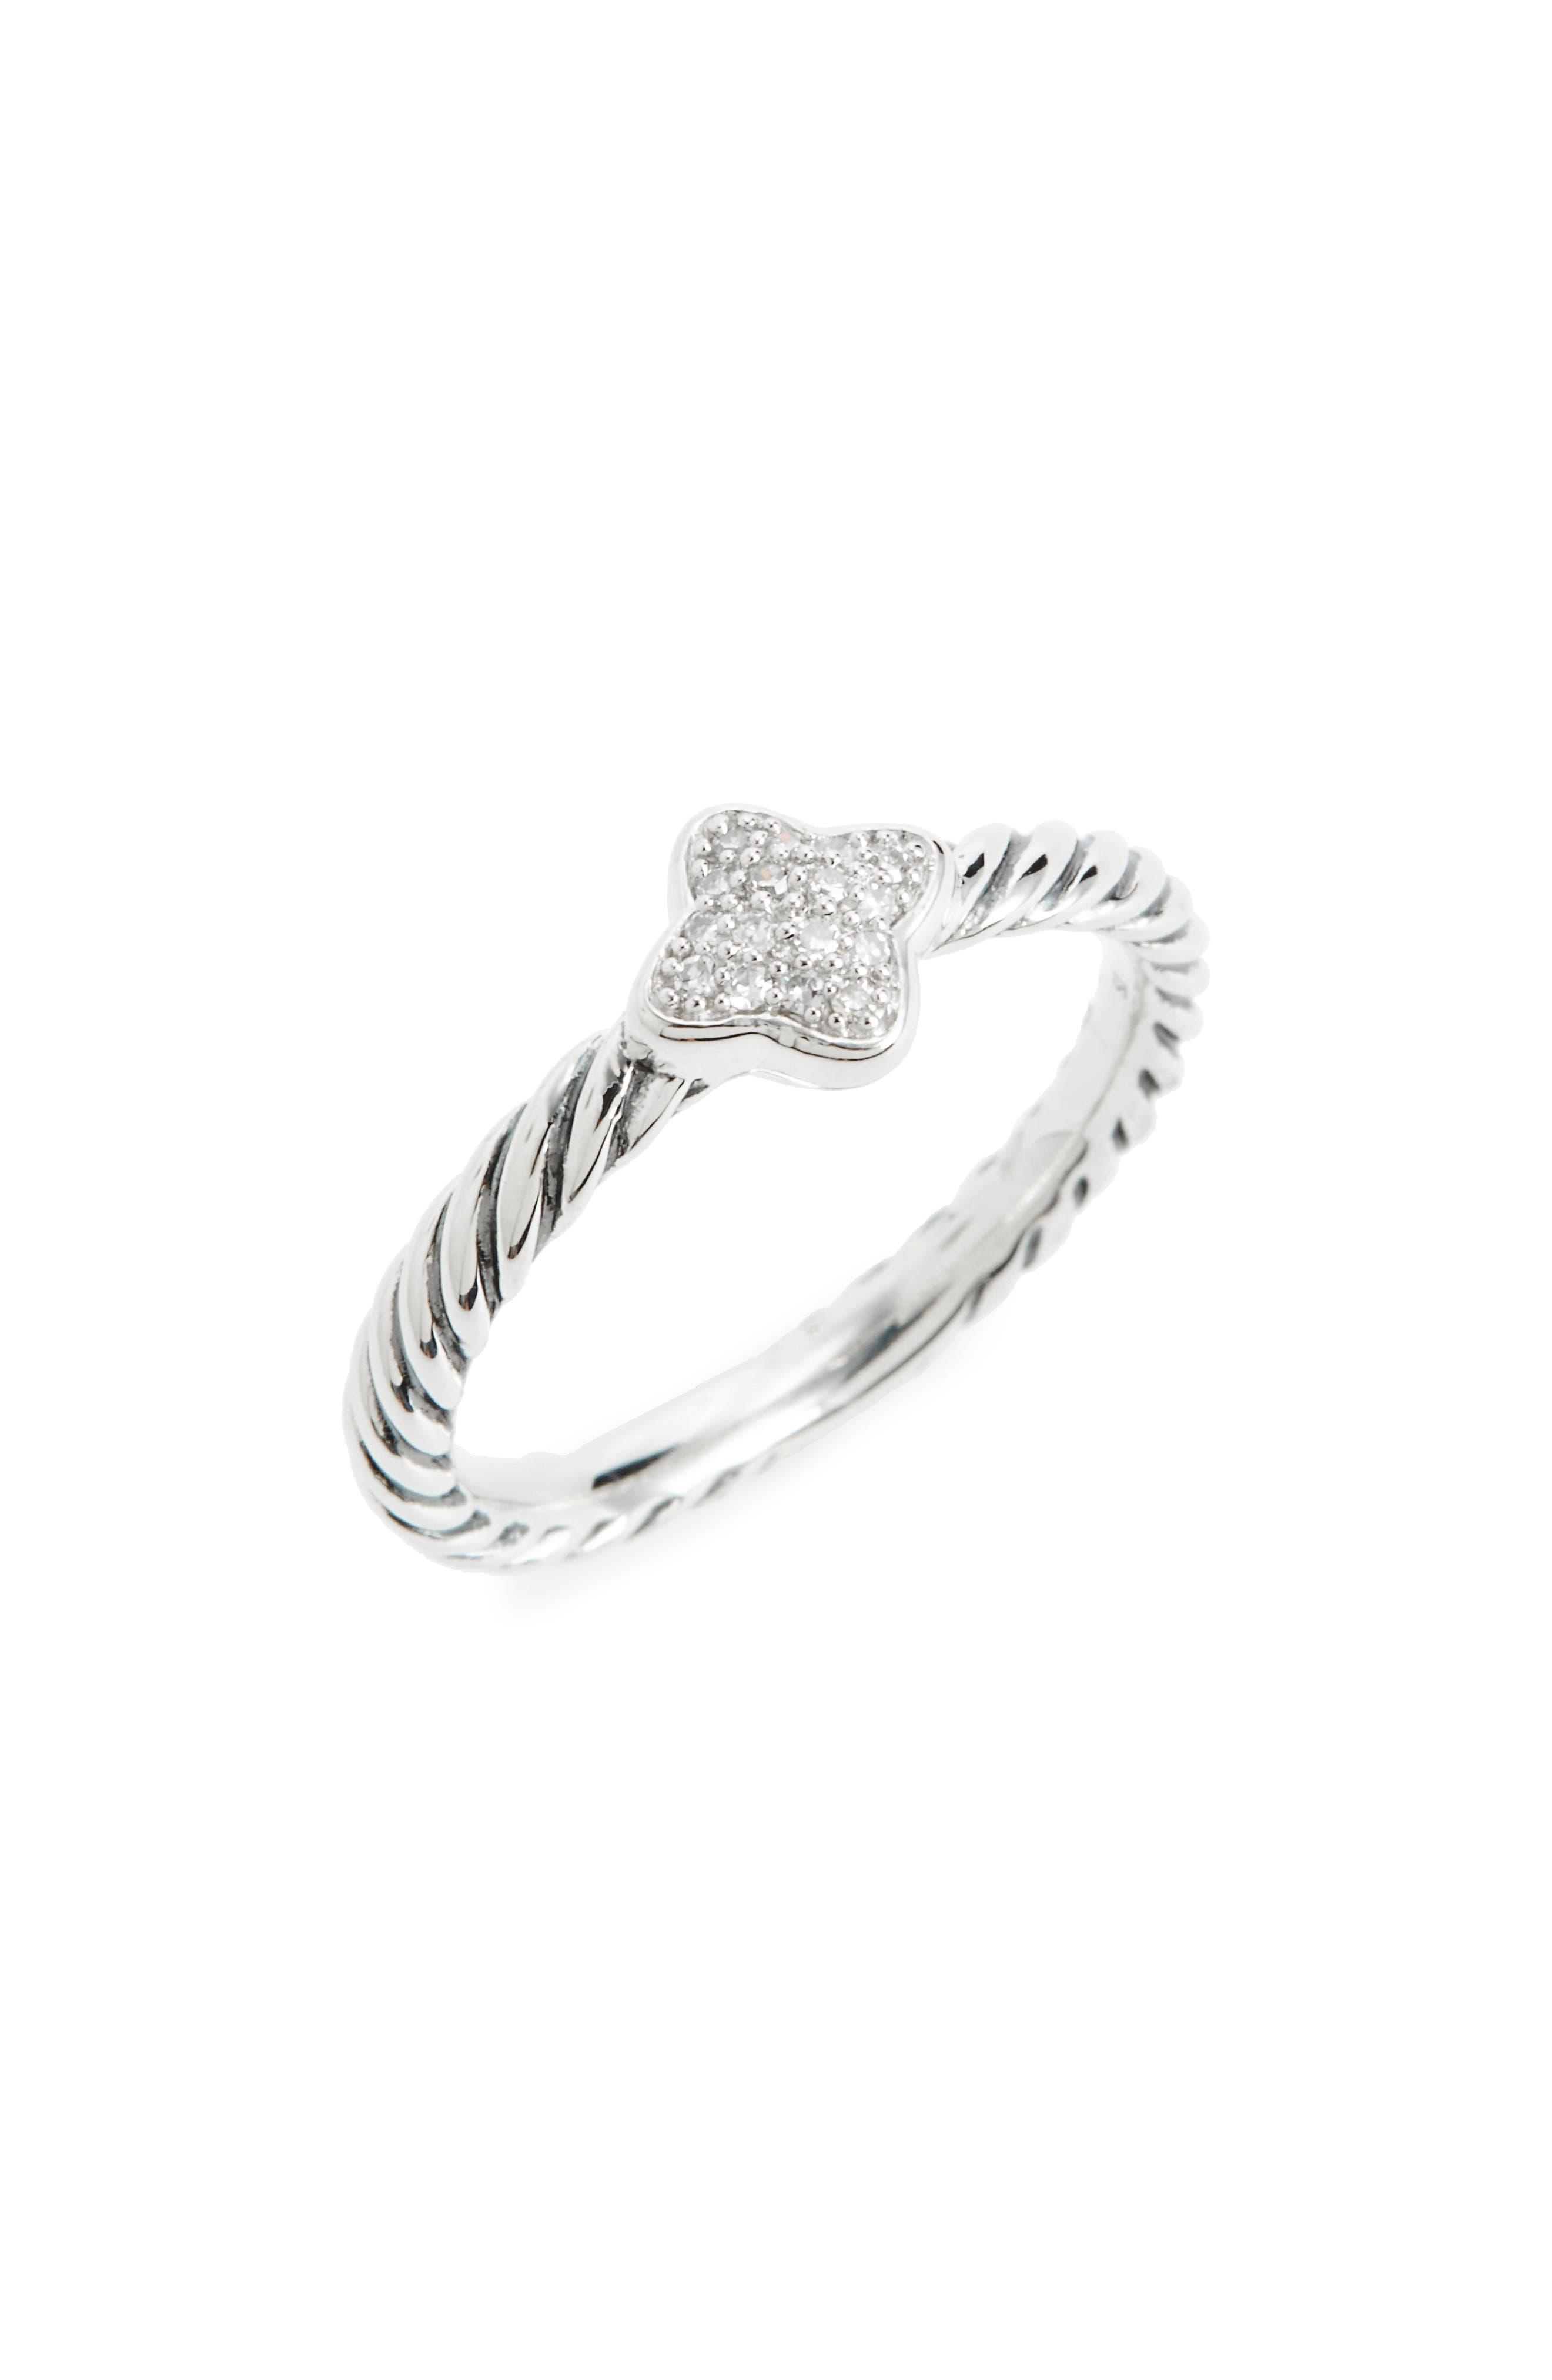 Quatrefoil Ring with Diamonds,                             Main thumbnail 1, color,                             100